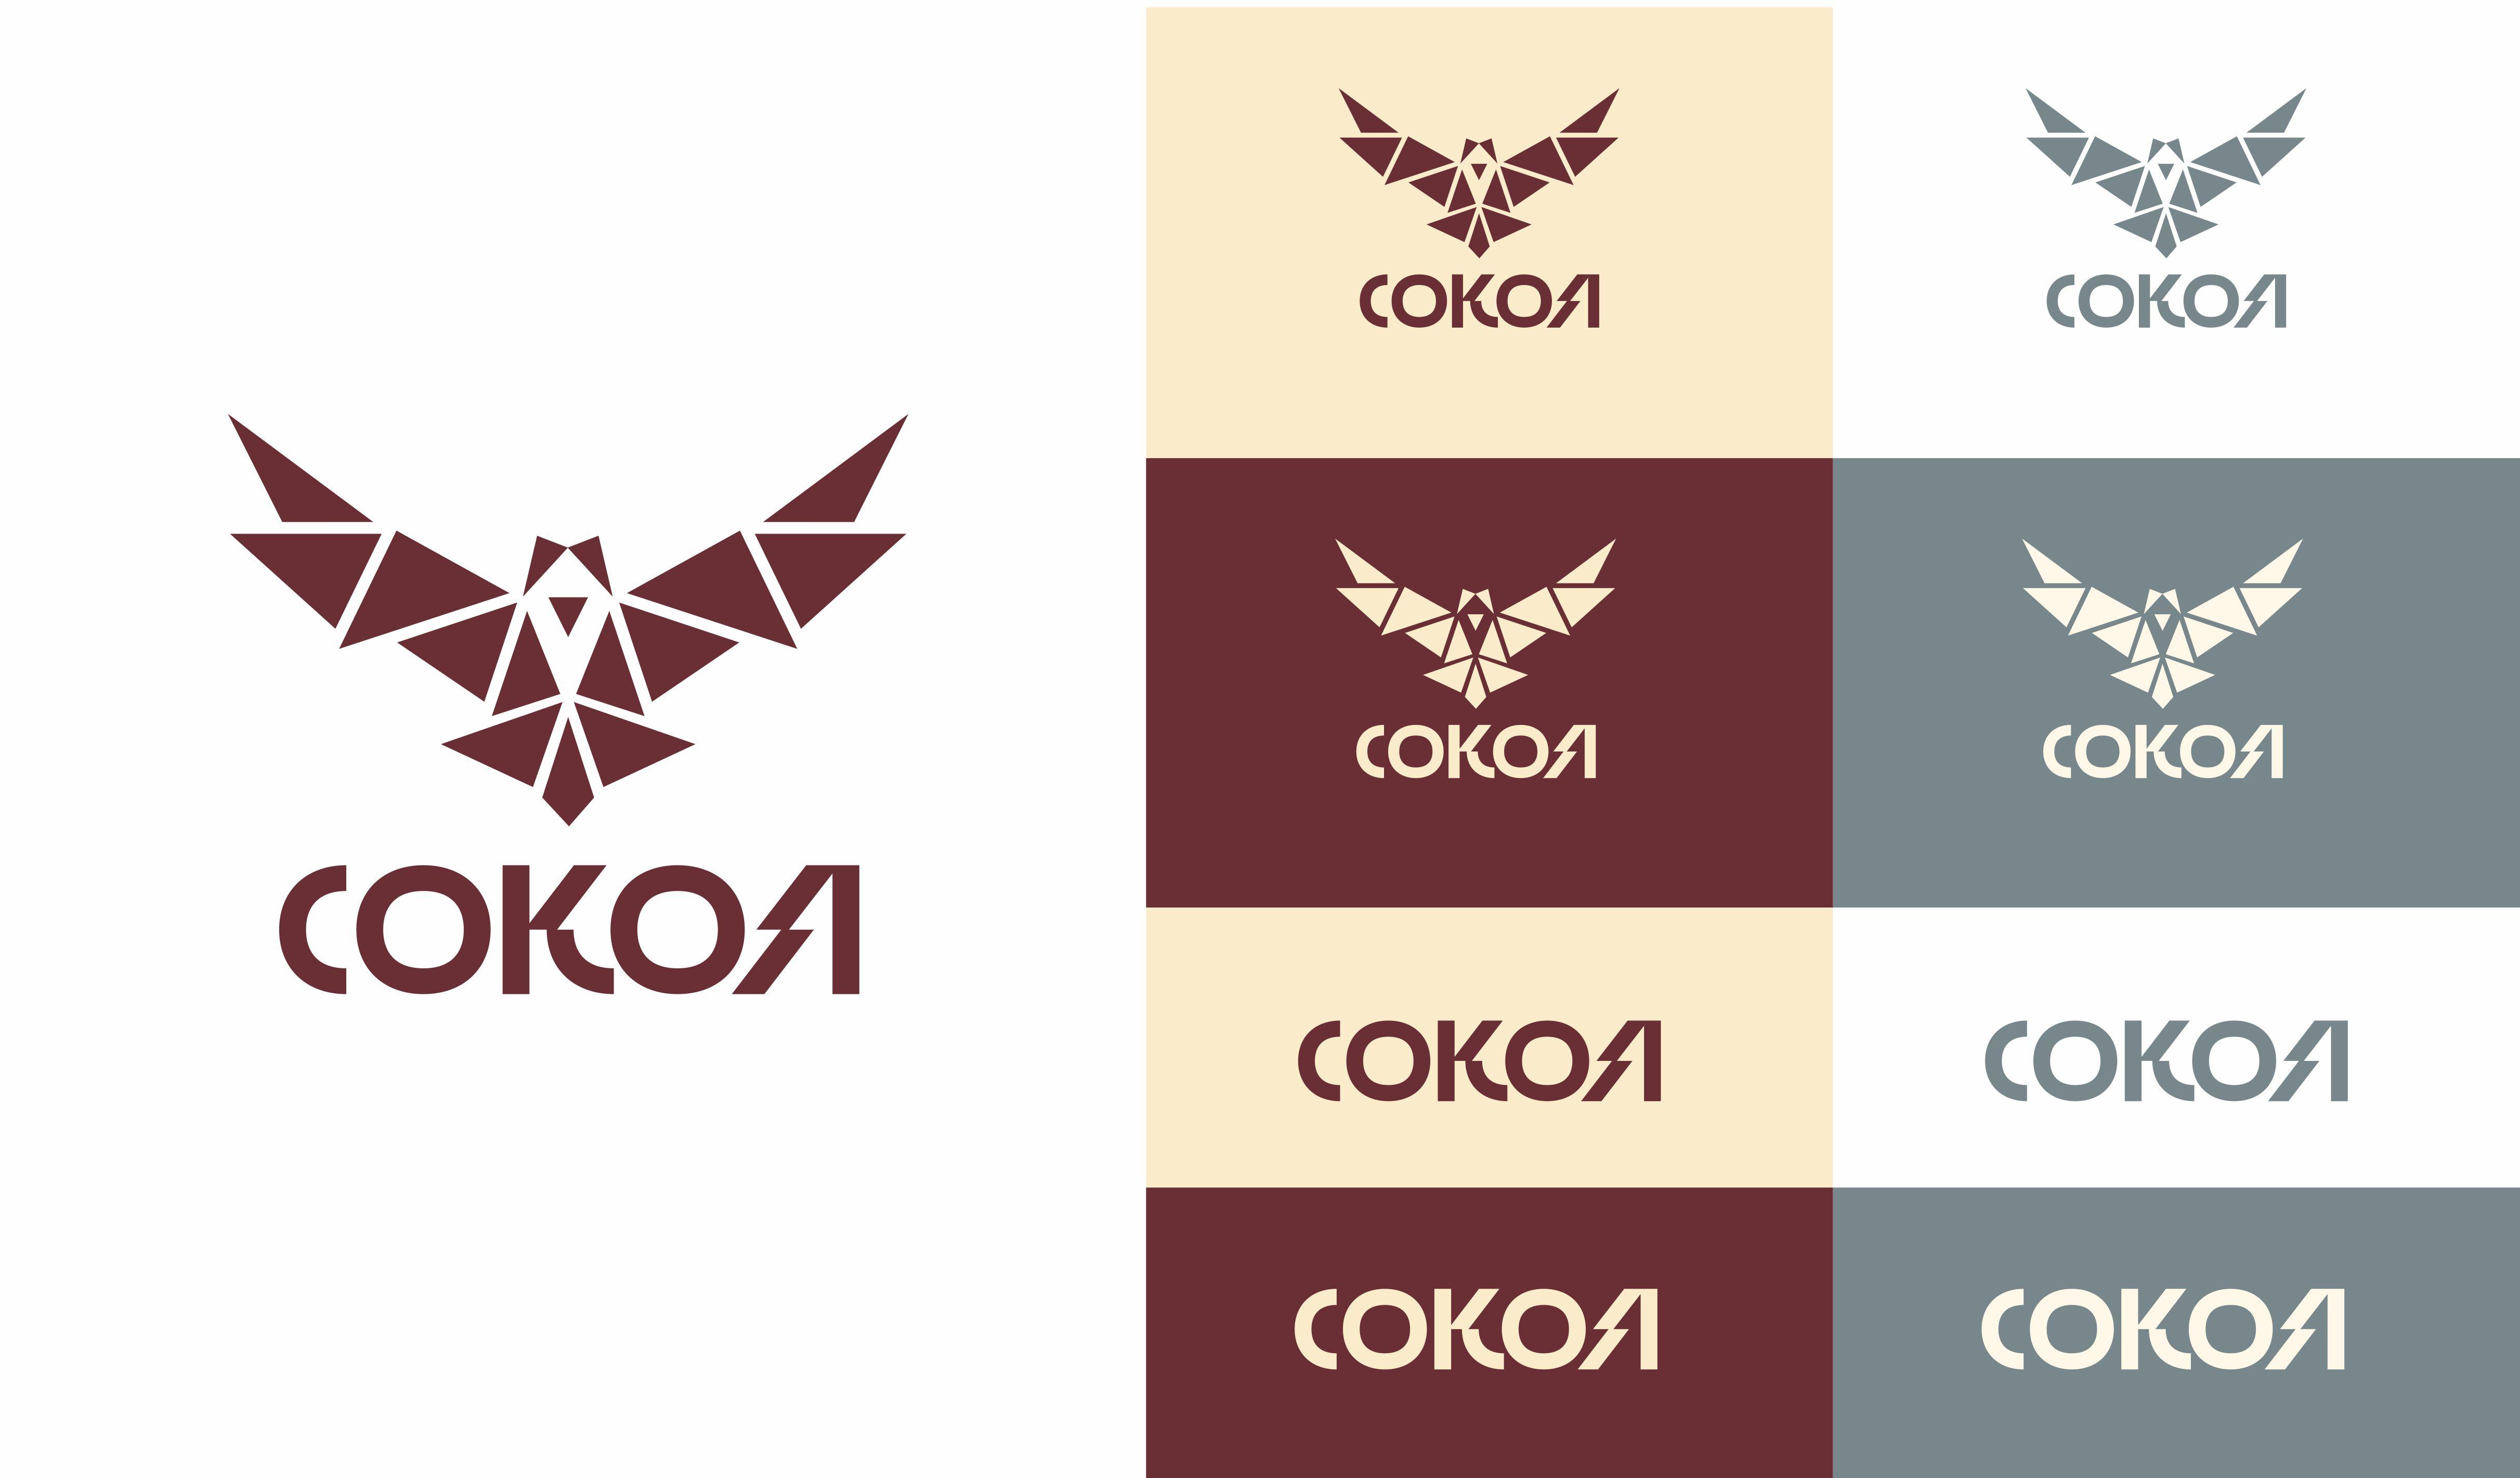 Дизайн логотипа столярной мастерской фото f_5115cfcc3b255f23.jpg